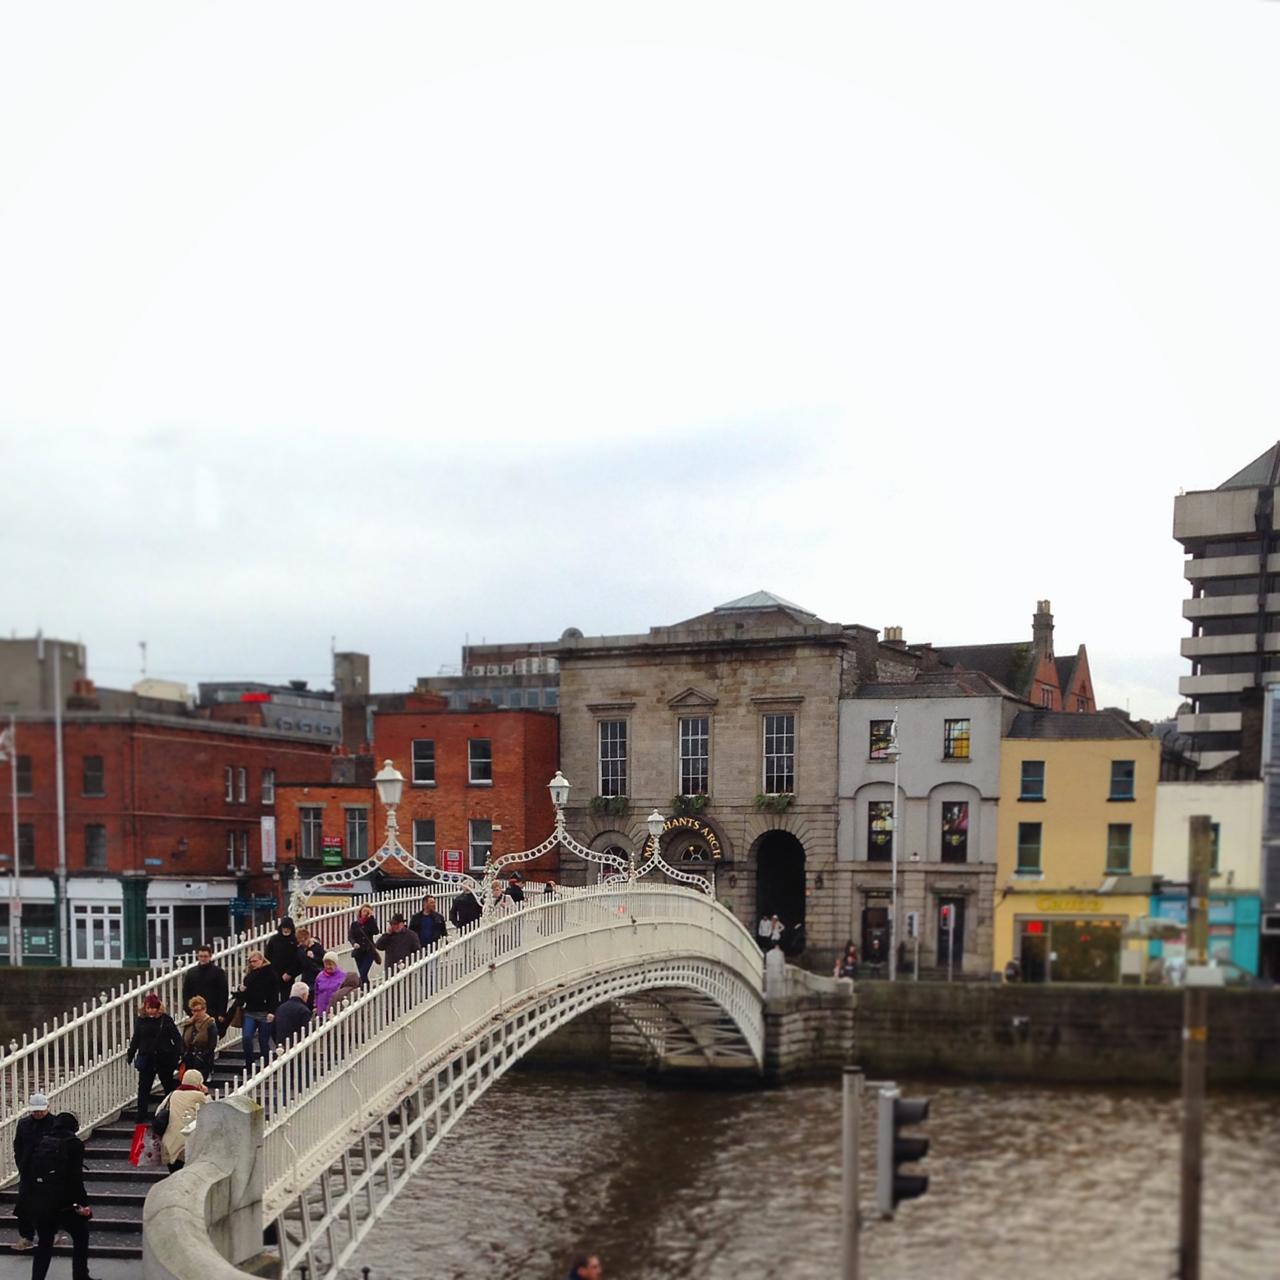 BLOG GUIDE DUBLIN, DUBLIN GUIDE, DUBLIN RESTAURANTS BARS, DUBLIN THINGS TO DO, DUBLIN TOUR GUIDE, EUROPEAN CITY BREAK DUBLIN, GASTROGAYS DUBLIN, GAY TRAVEL DUBLIN, GAY TRAVEL IRELAND, LGBT DUBLIN, WEEKEND DUBLIN